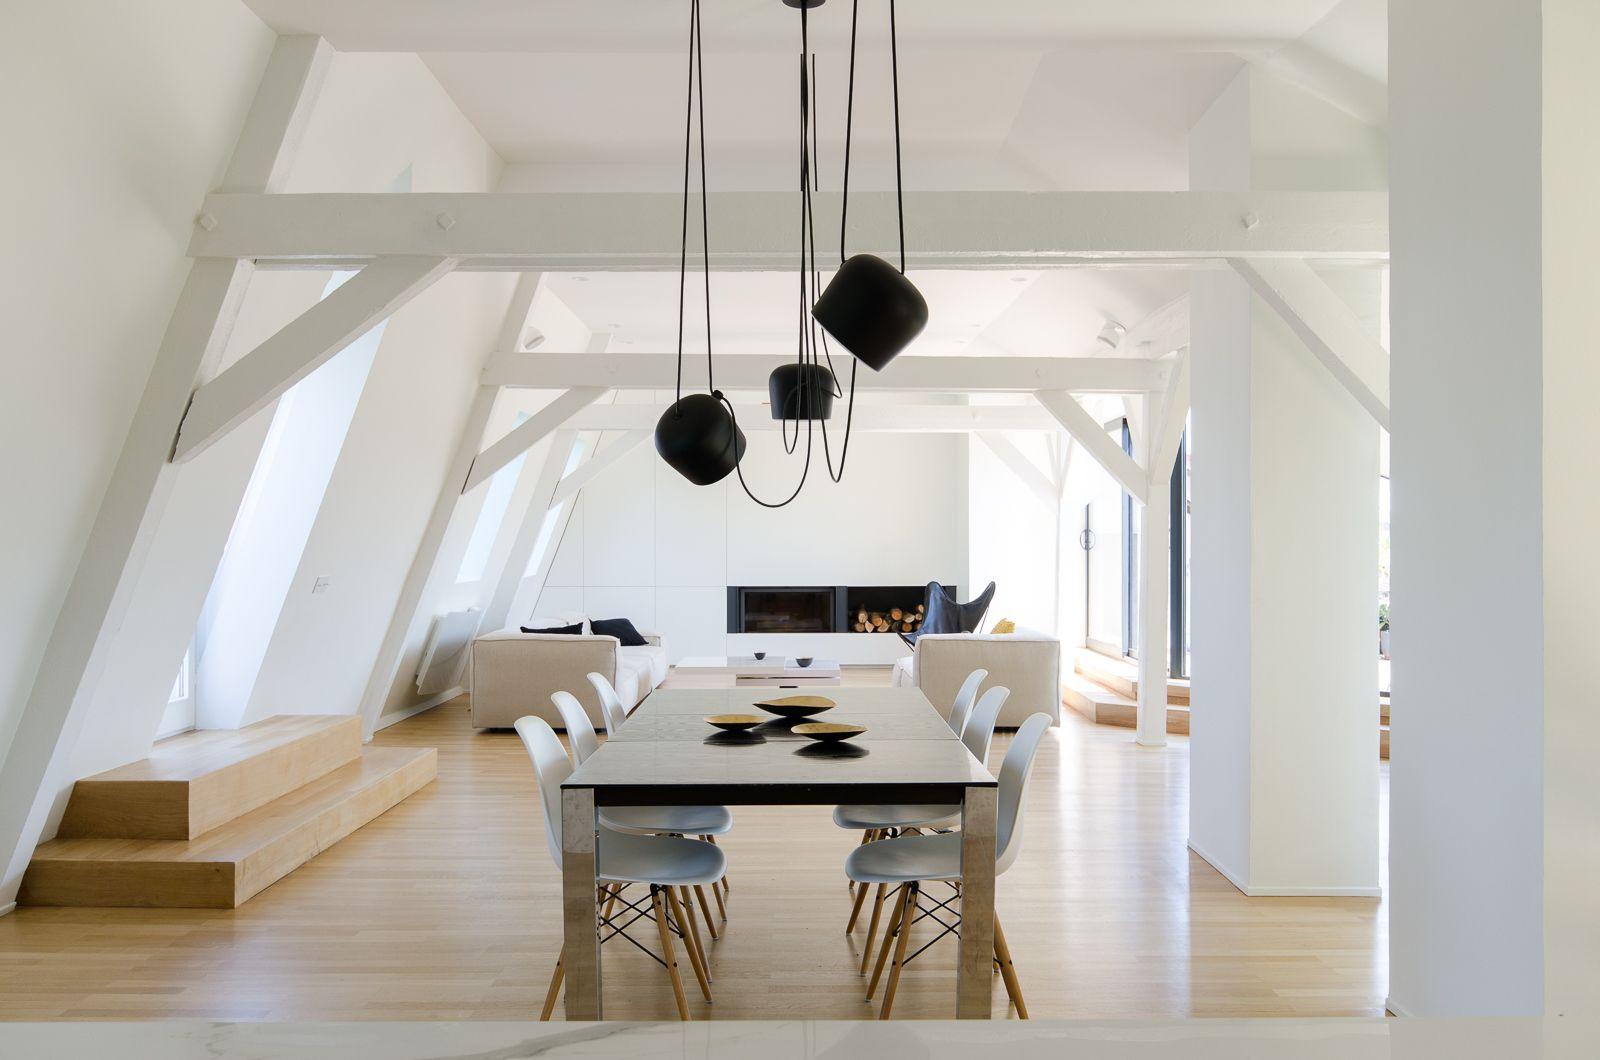 Flos Aim Lamp In 2020 Loft Wohnung Wohnung Dachgeschosswohnung